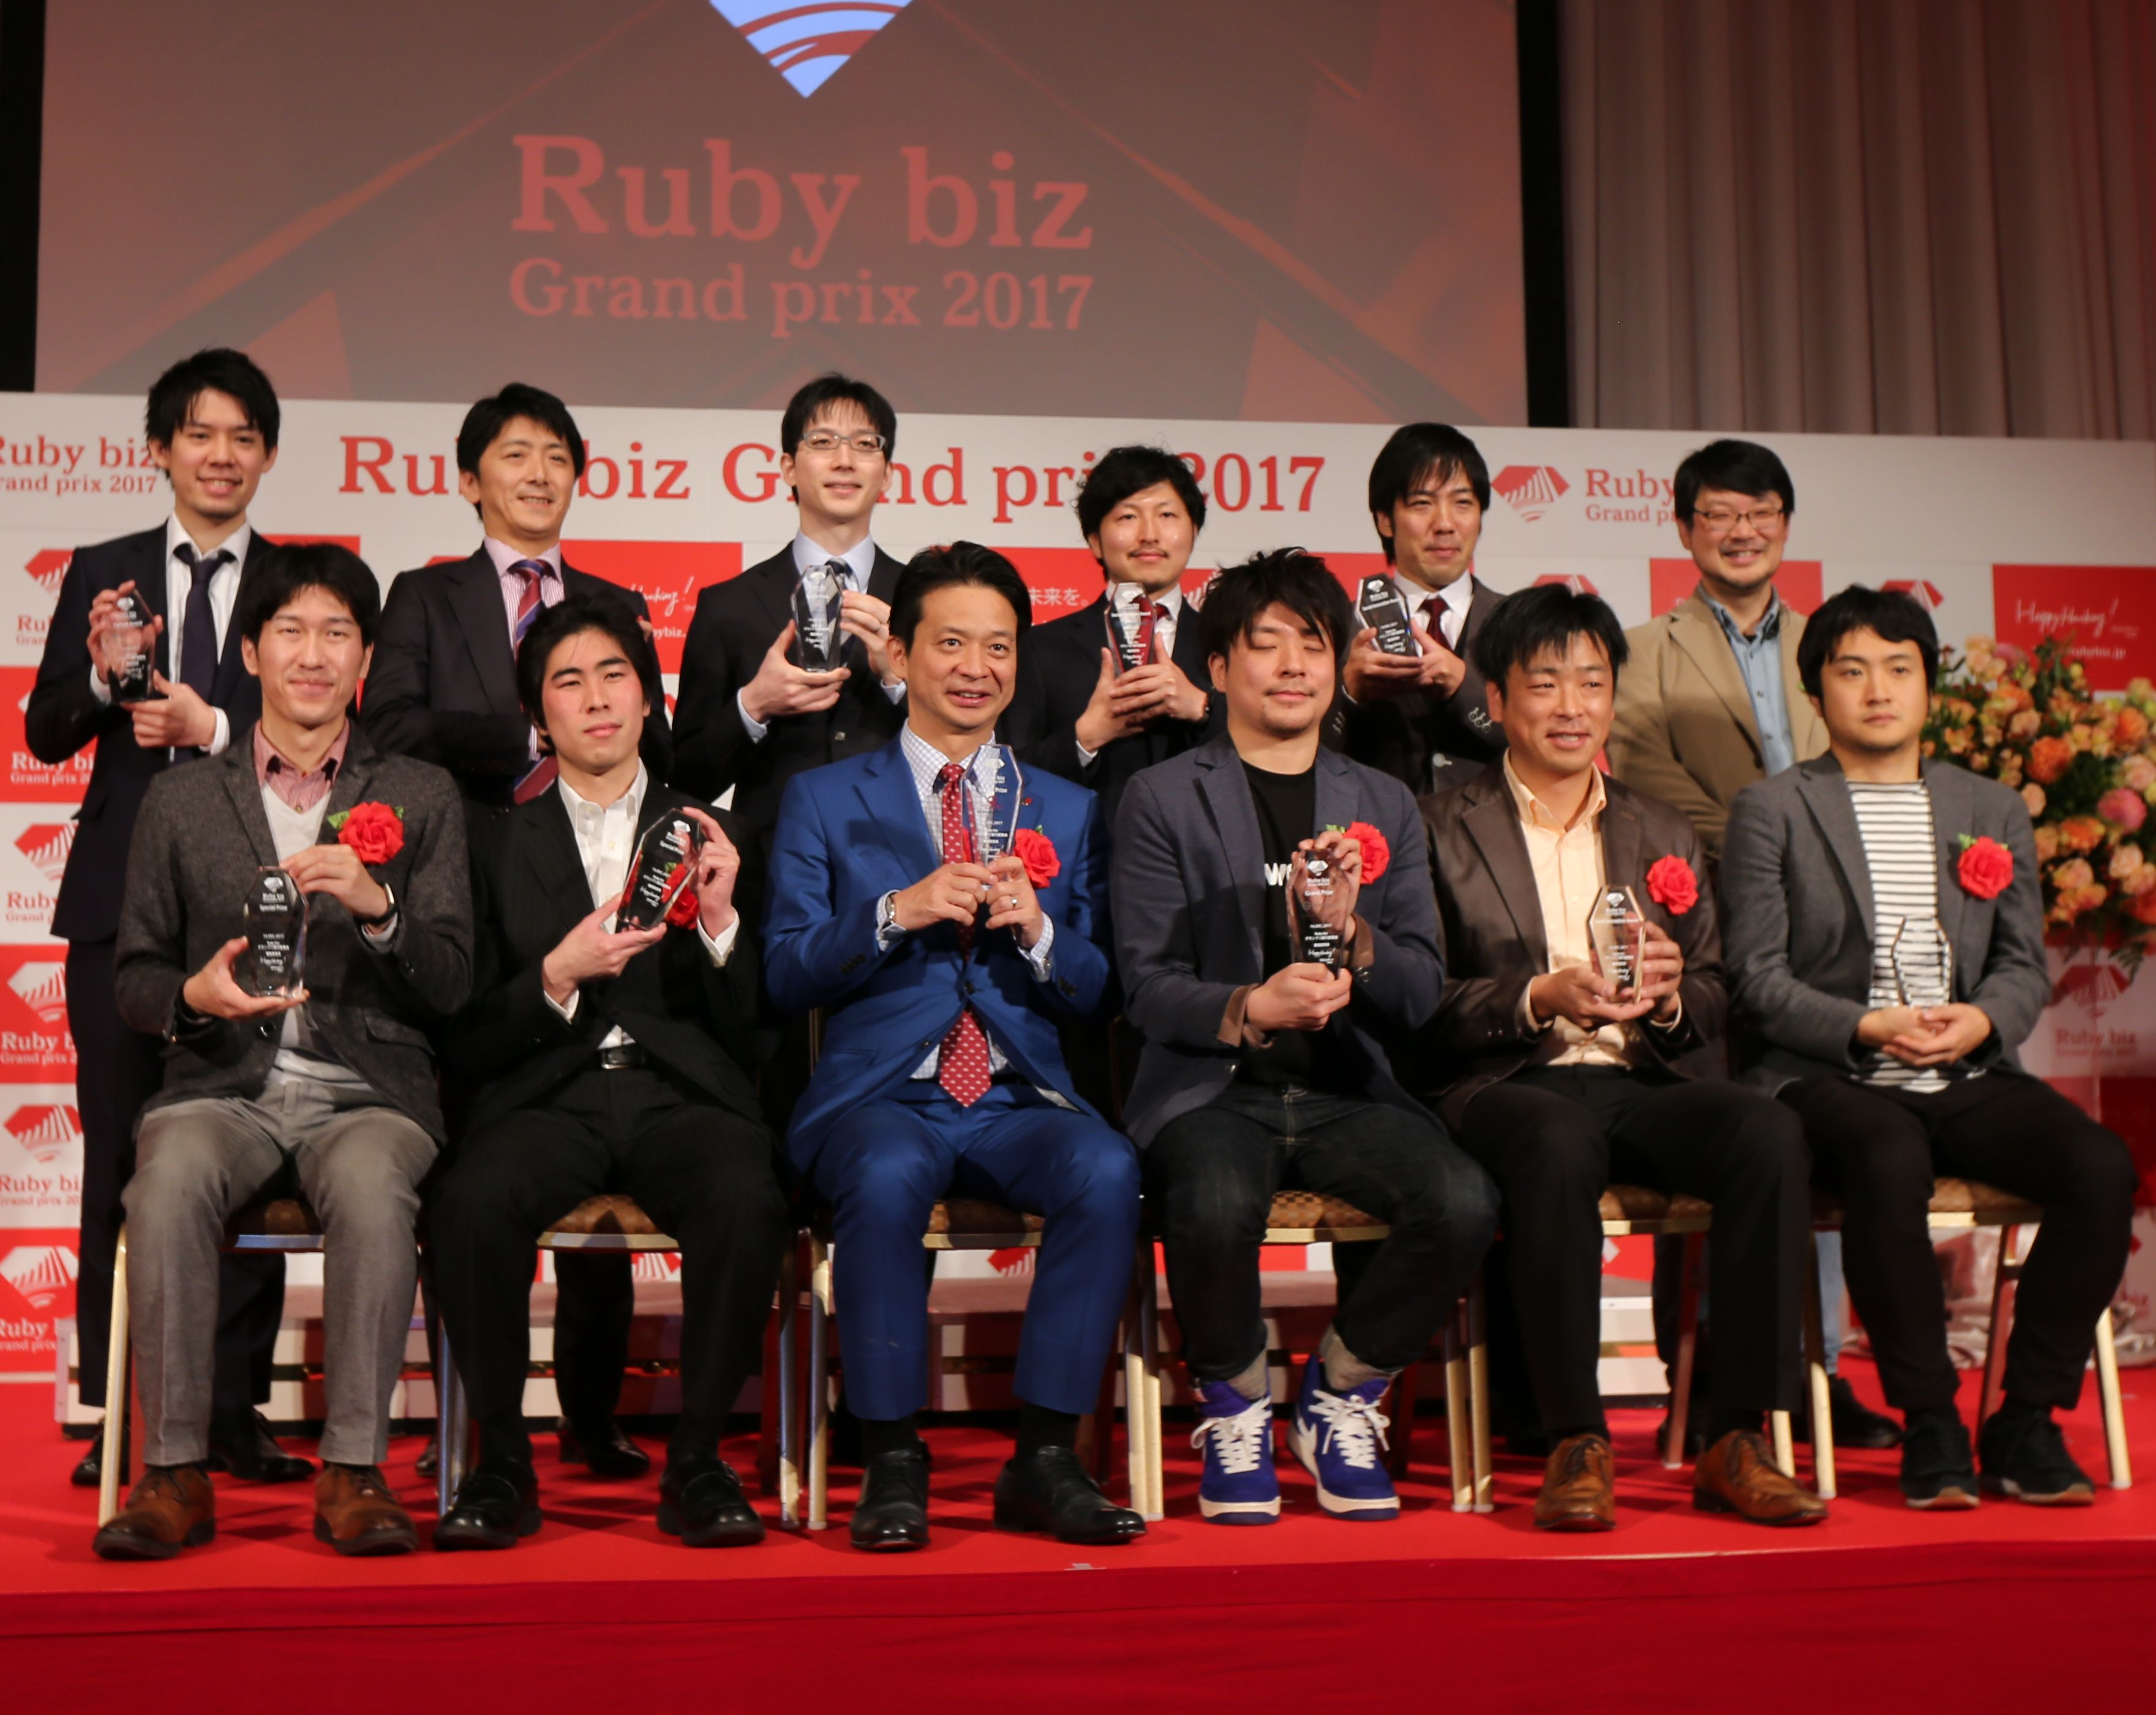 Rubyを使ってビジネス領域で新たな価値を創造 - Ruby biz Grand prix 2017